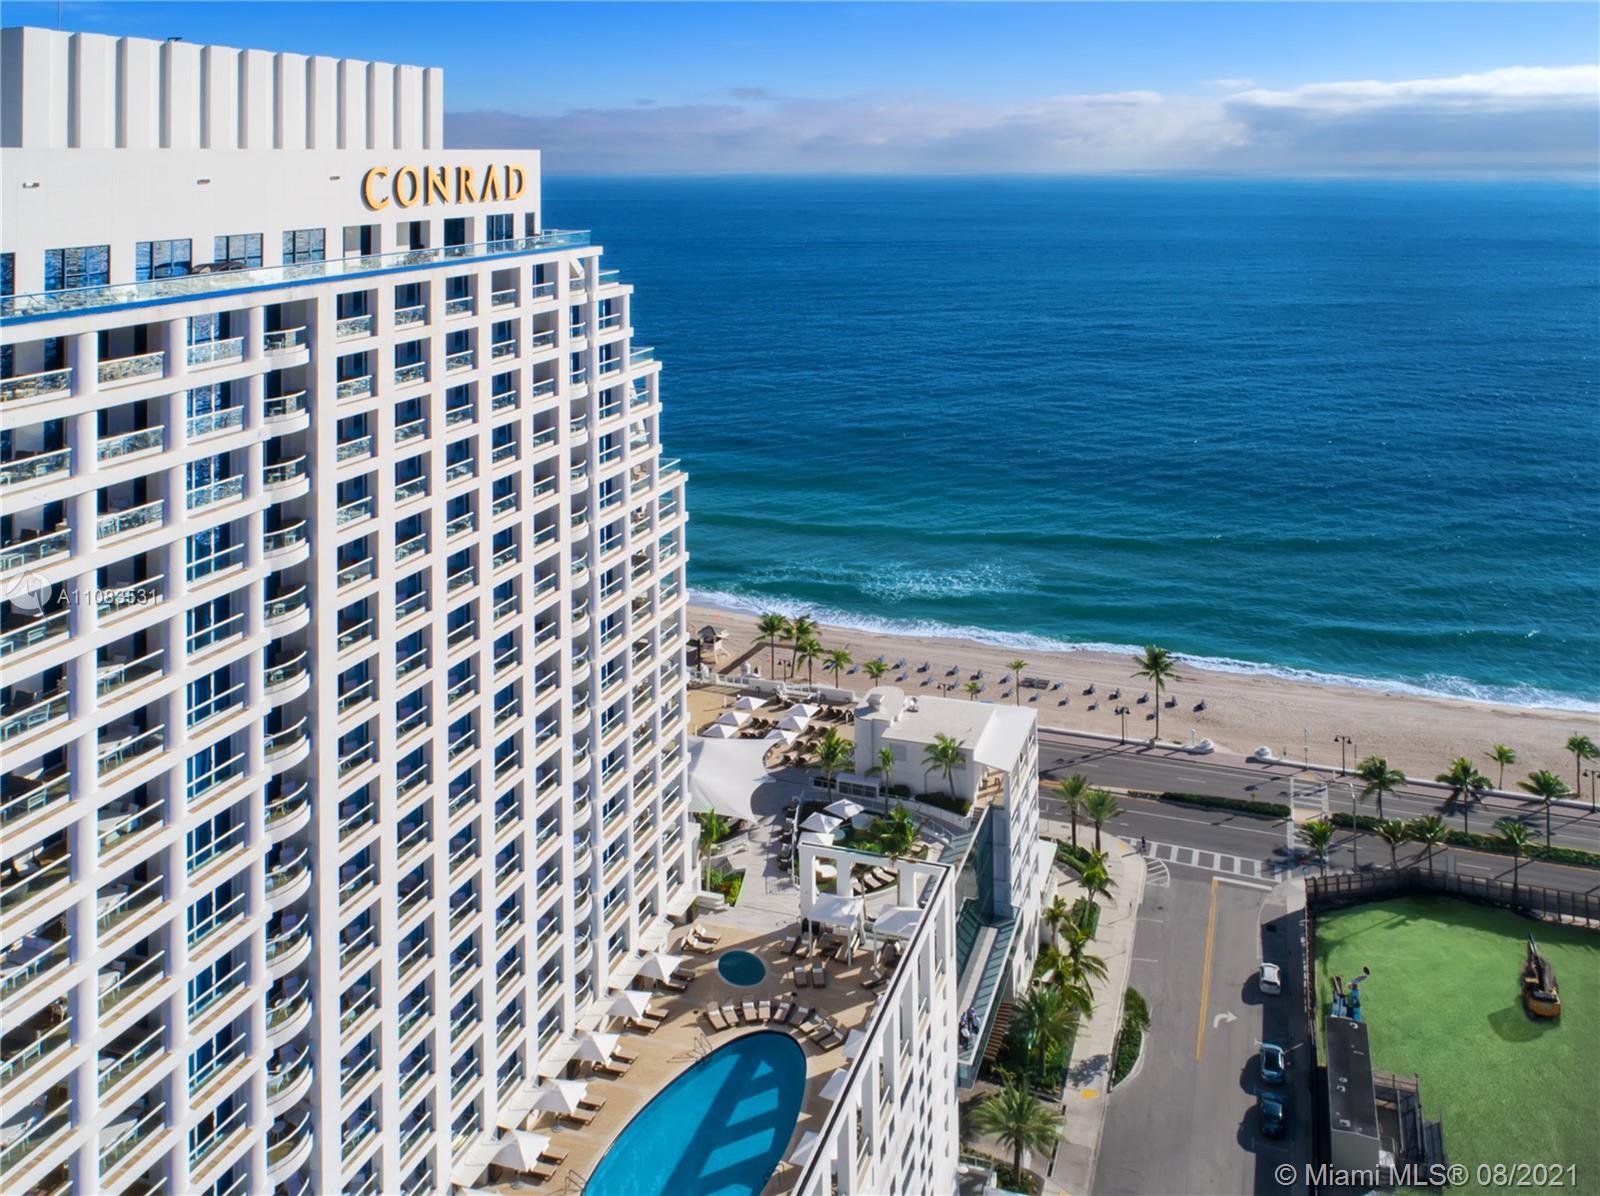 Ritz Carlton, Fort Lauderdale, 551 N Fort Lauderdale Beach Blvd Unit H812, Fort Lauderdale, Florida 33304